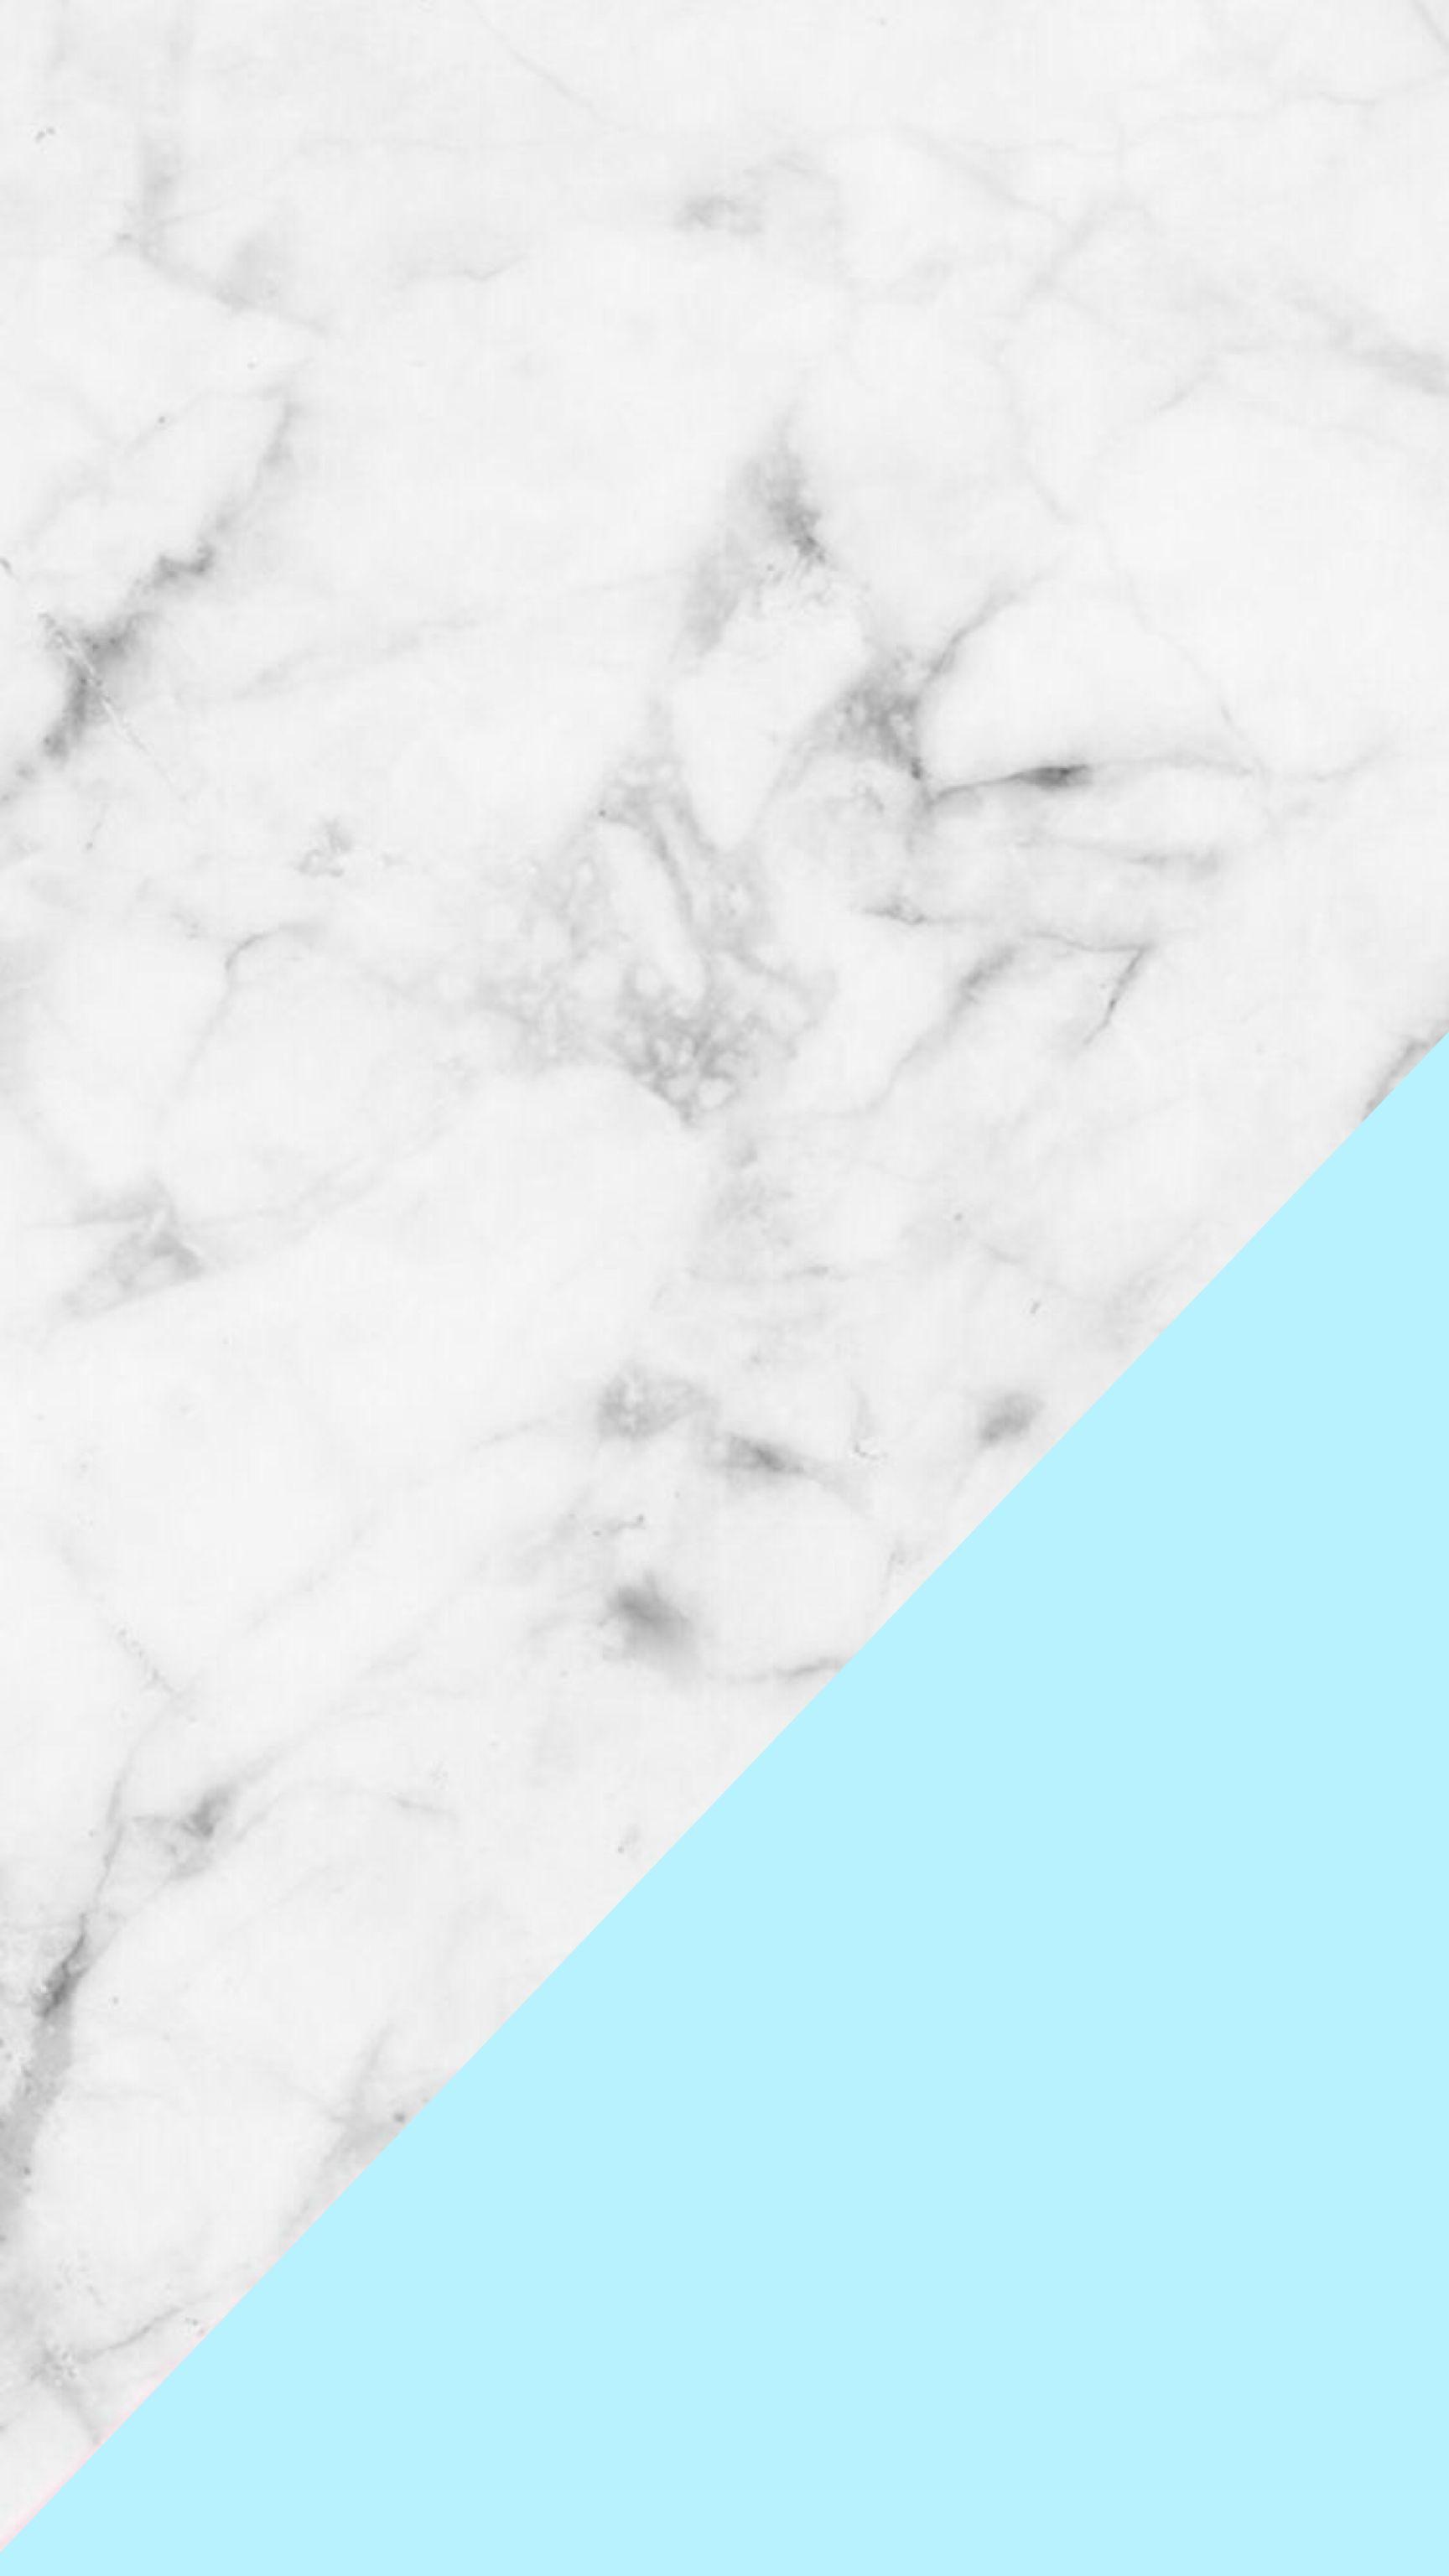 Good Wallpaper Marble Turquoise - 97bd70a43ba971e2cc1745684e83f510  HD_611359.jpg